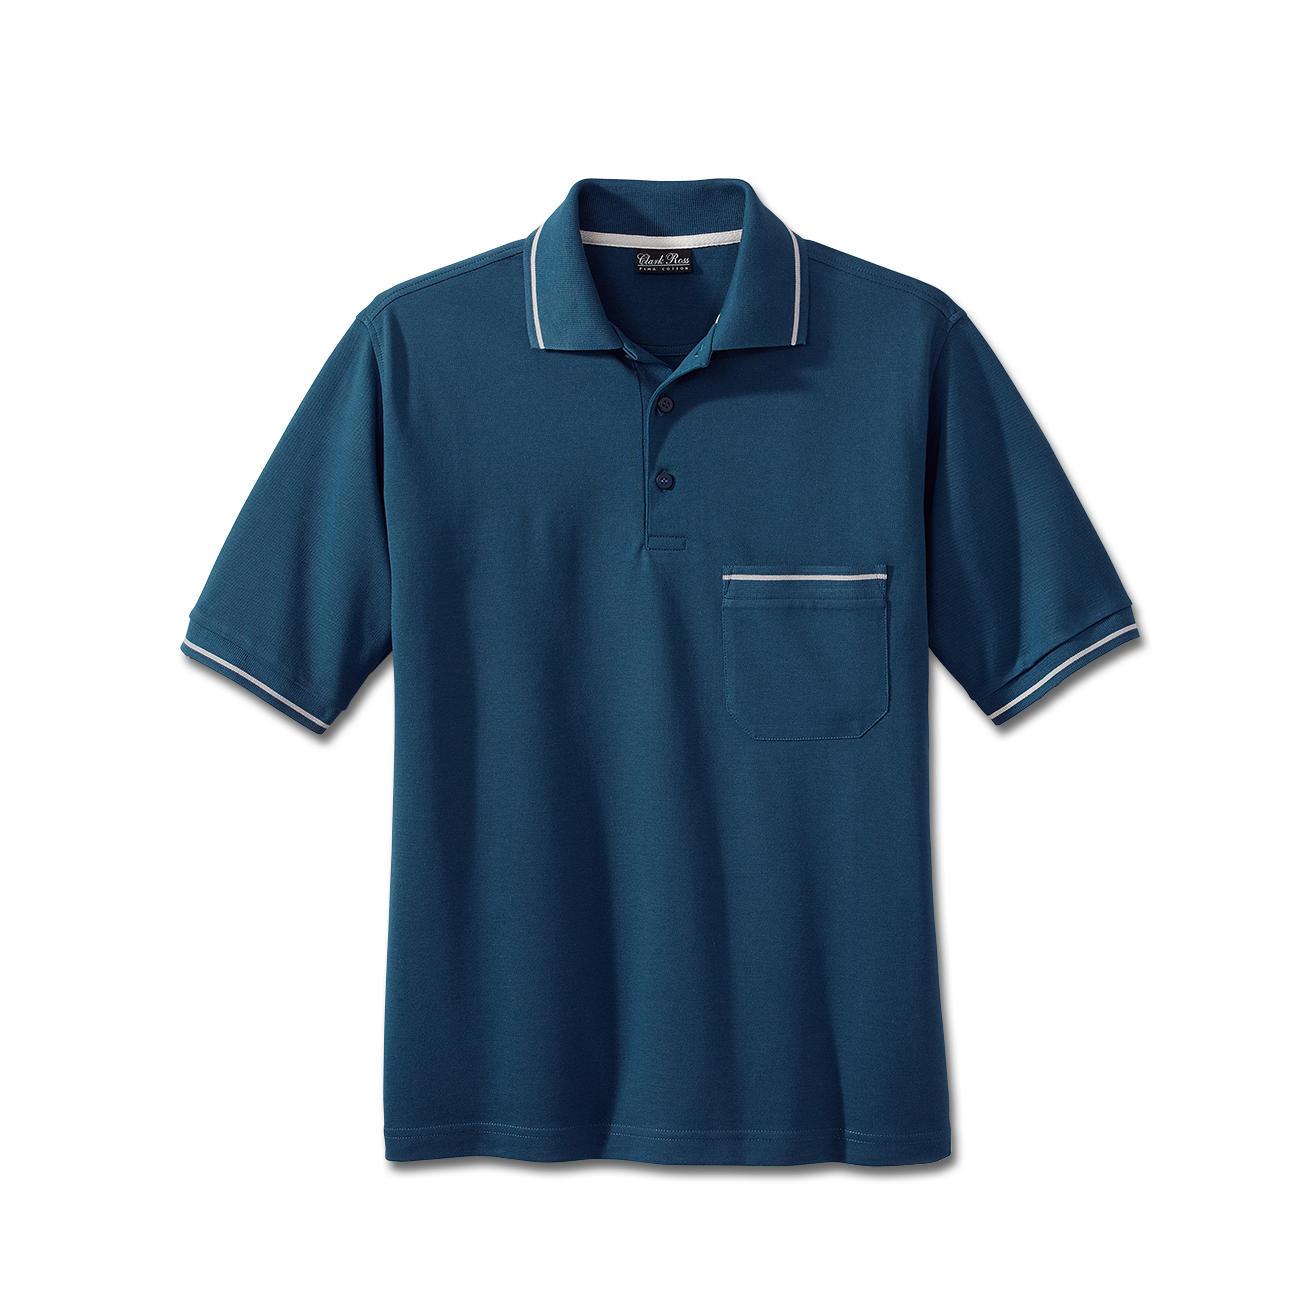 Adidas Golf bet at home.party GetJar aplikacja bet at home Zdjęcie bet at homers Shirts Women